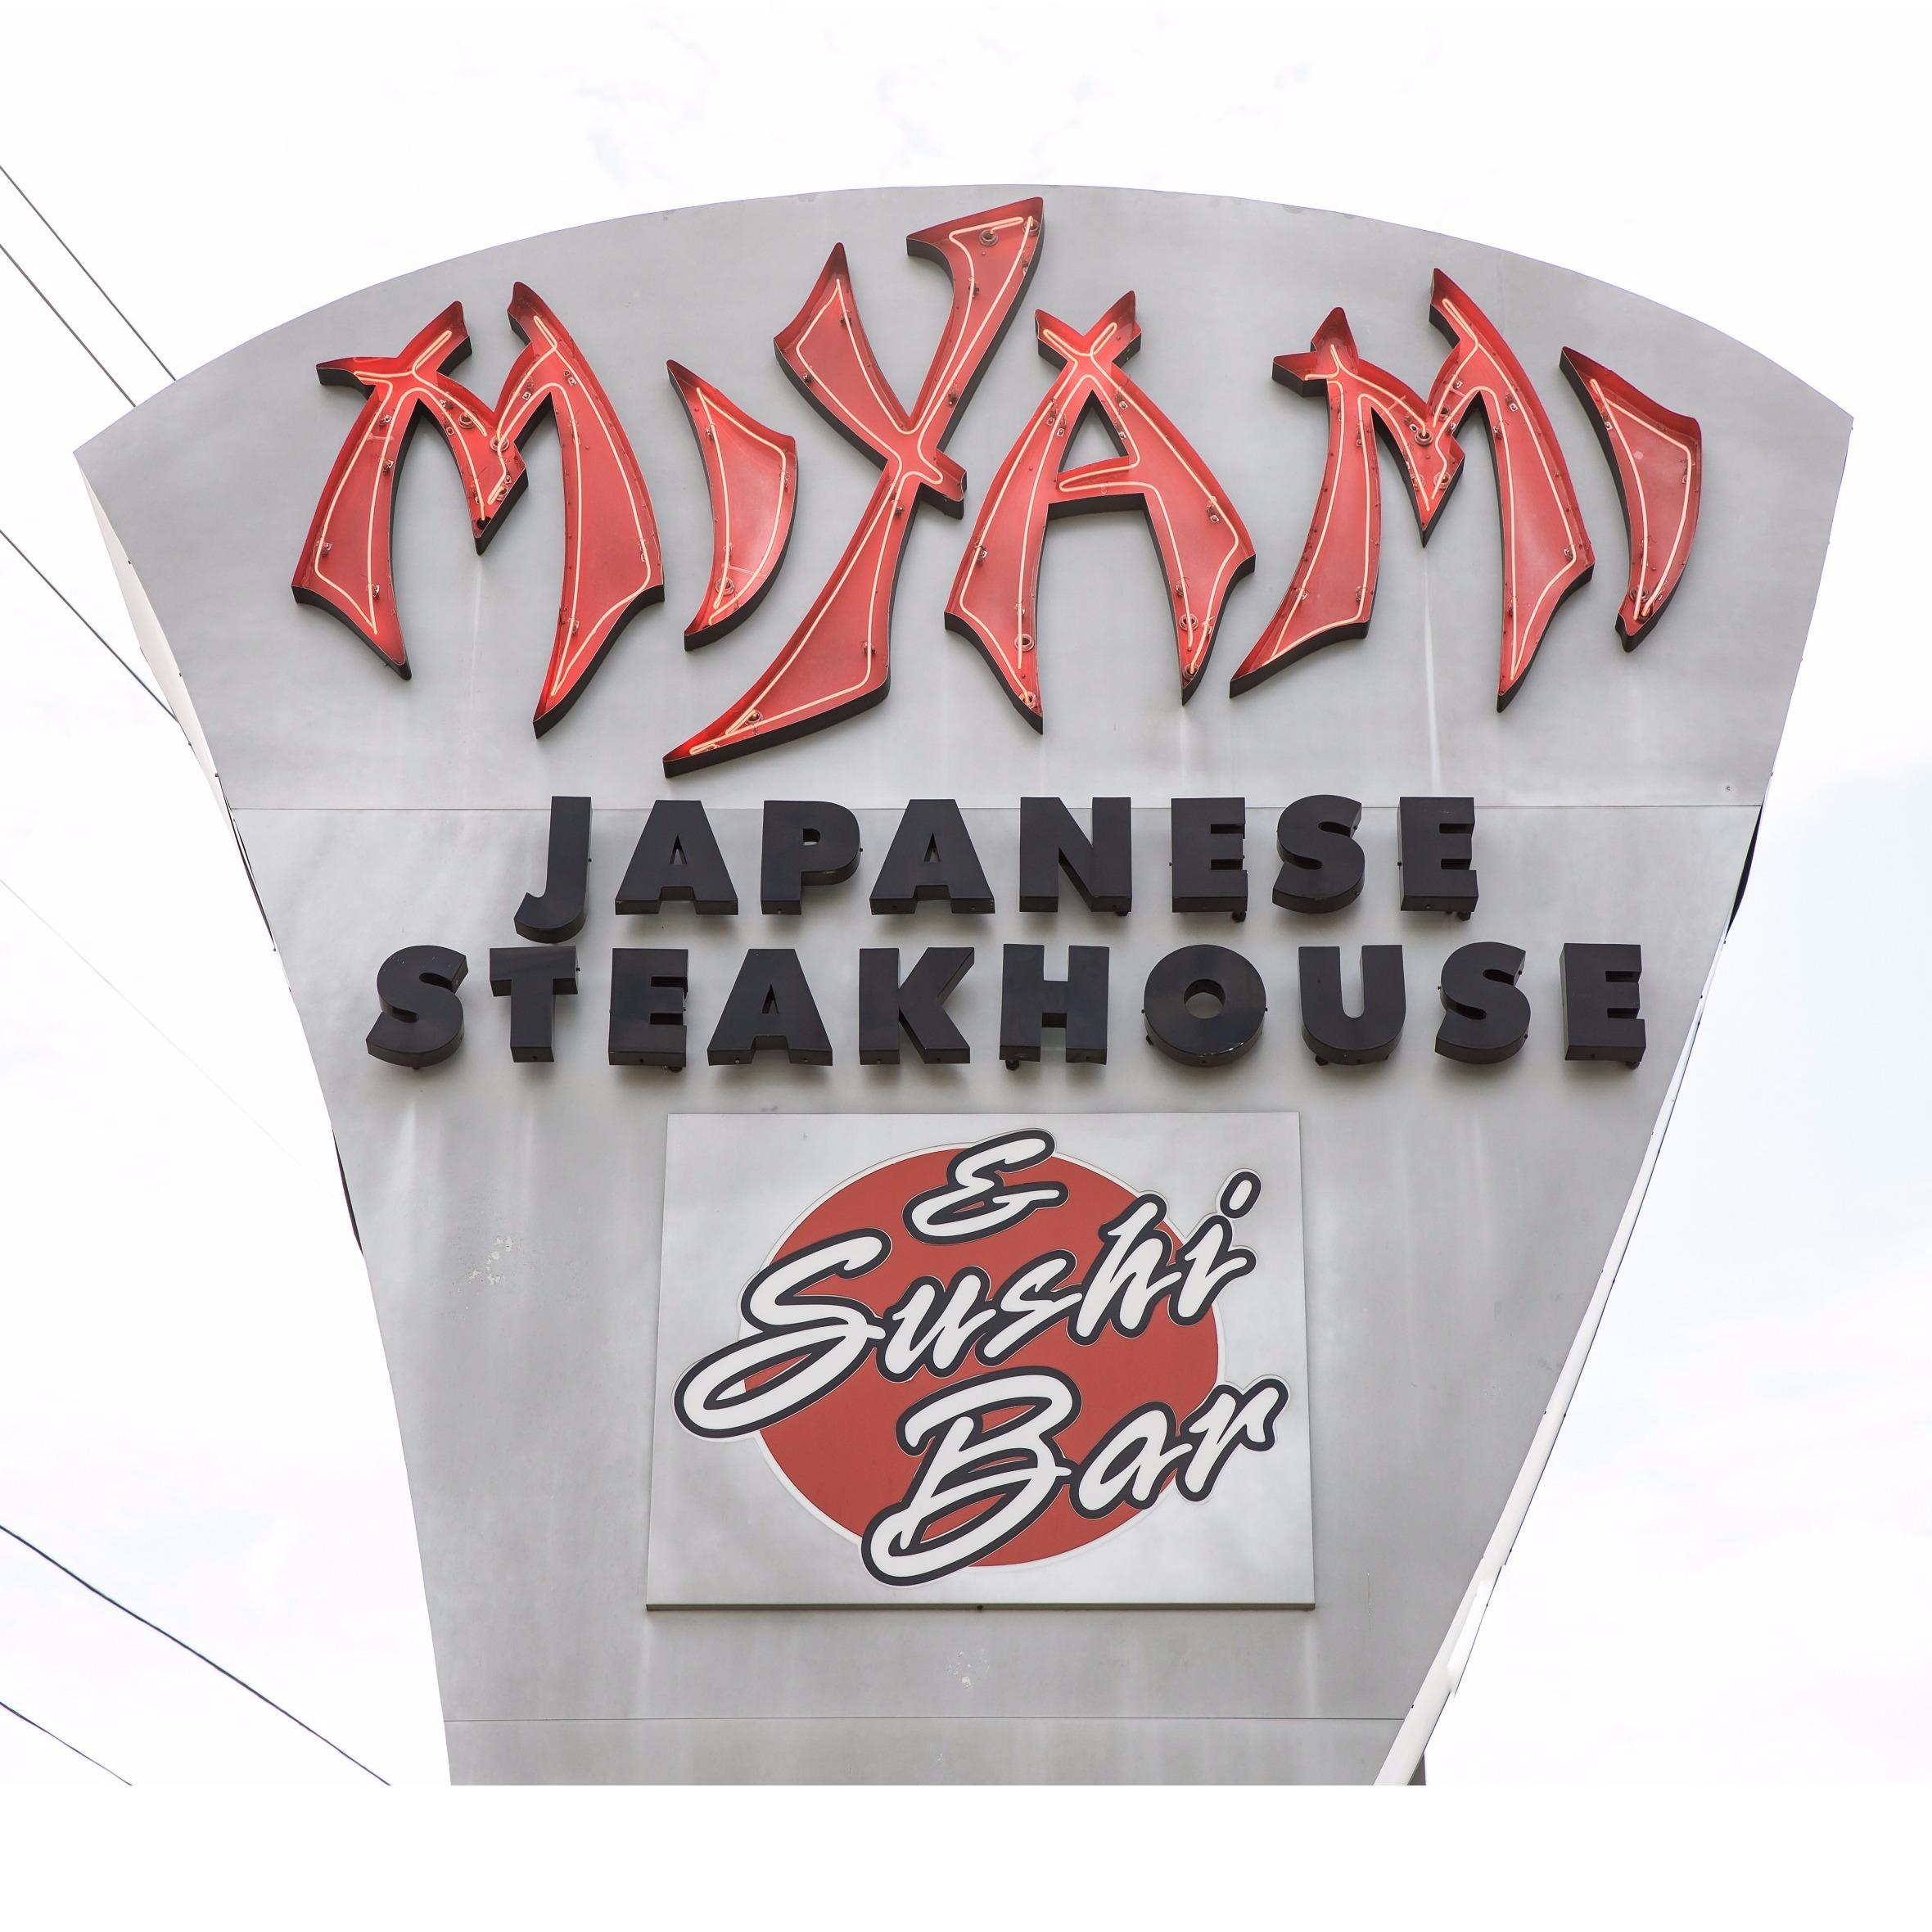 Miyami Japanese Steakhouse